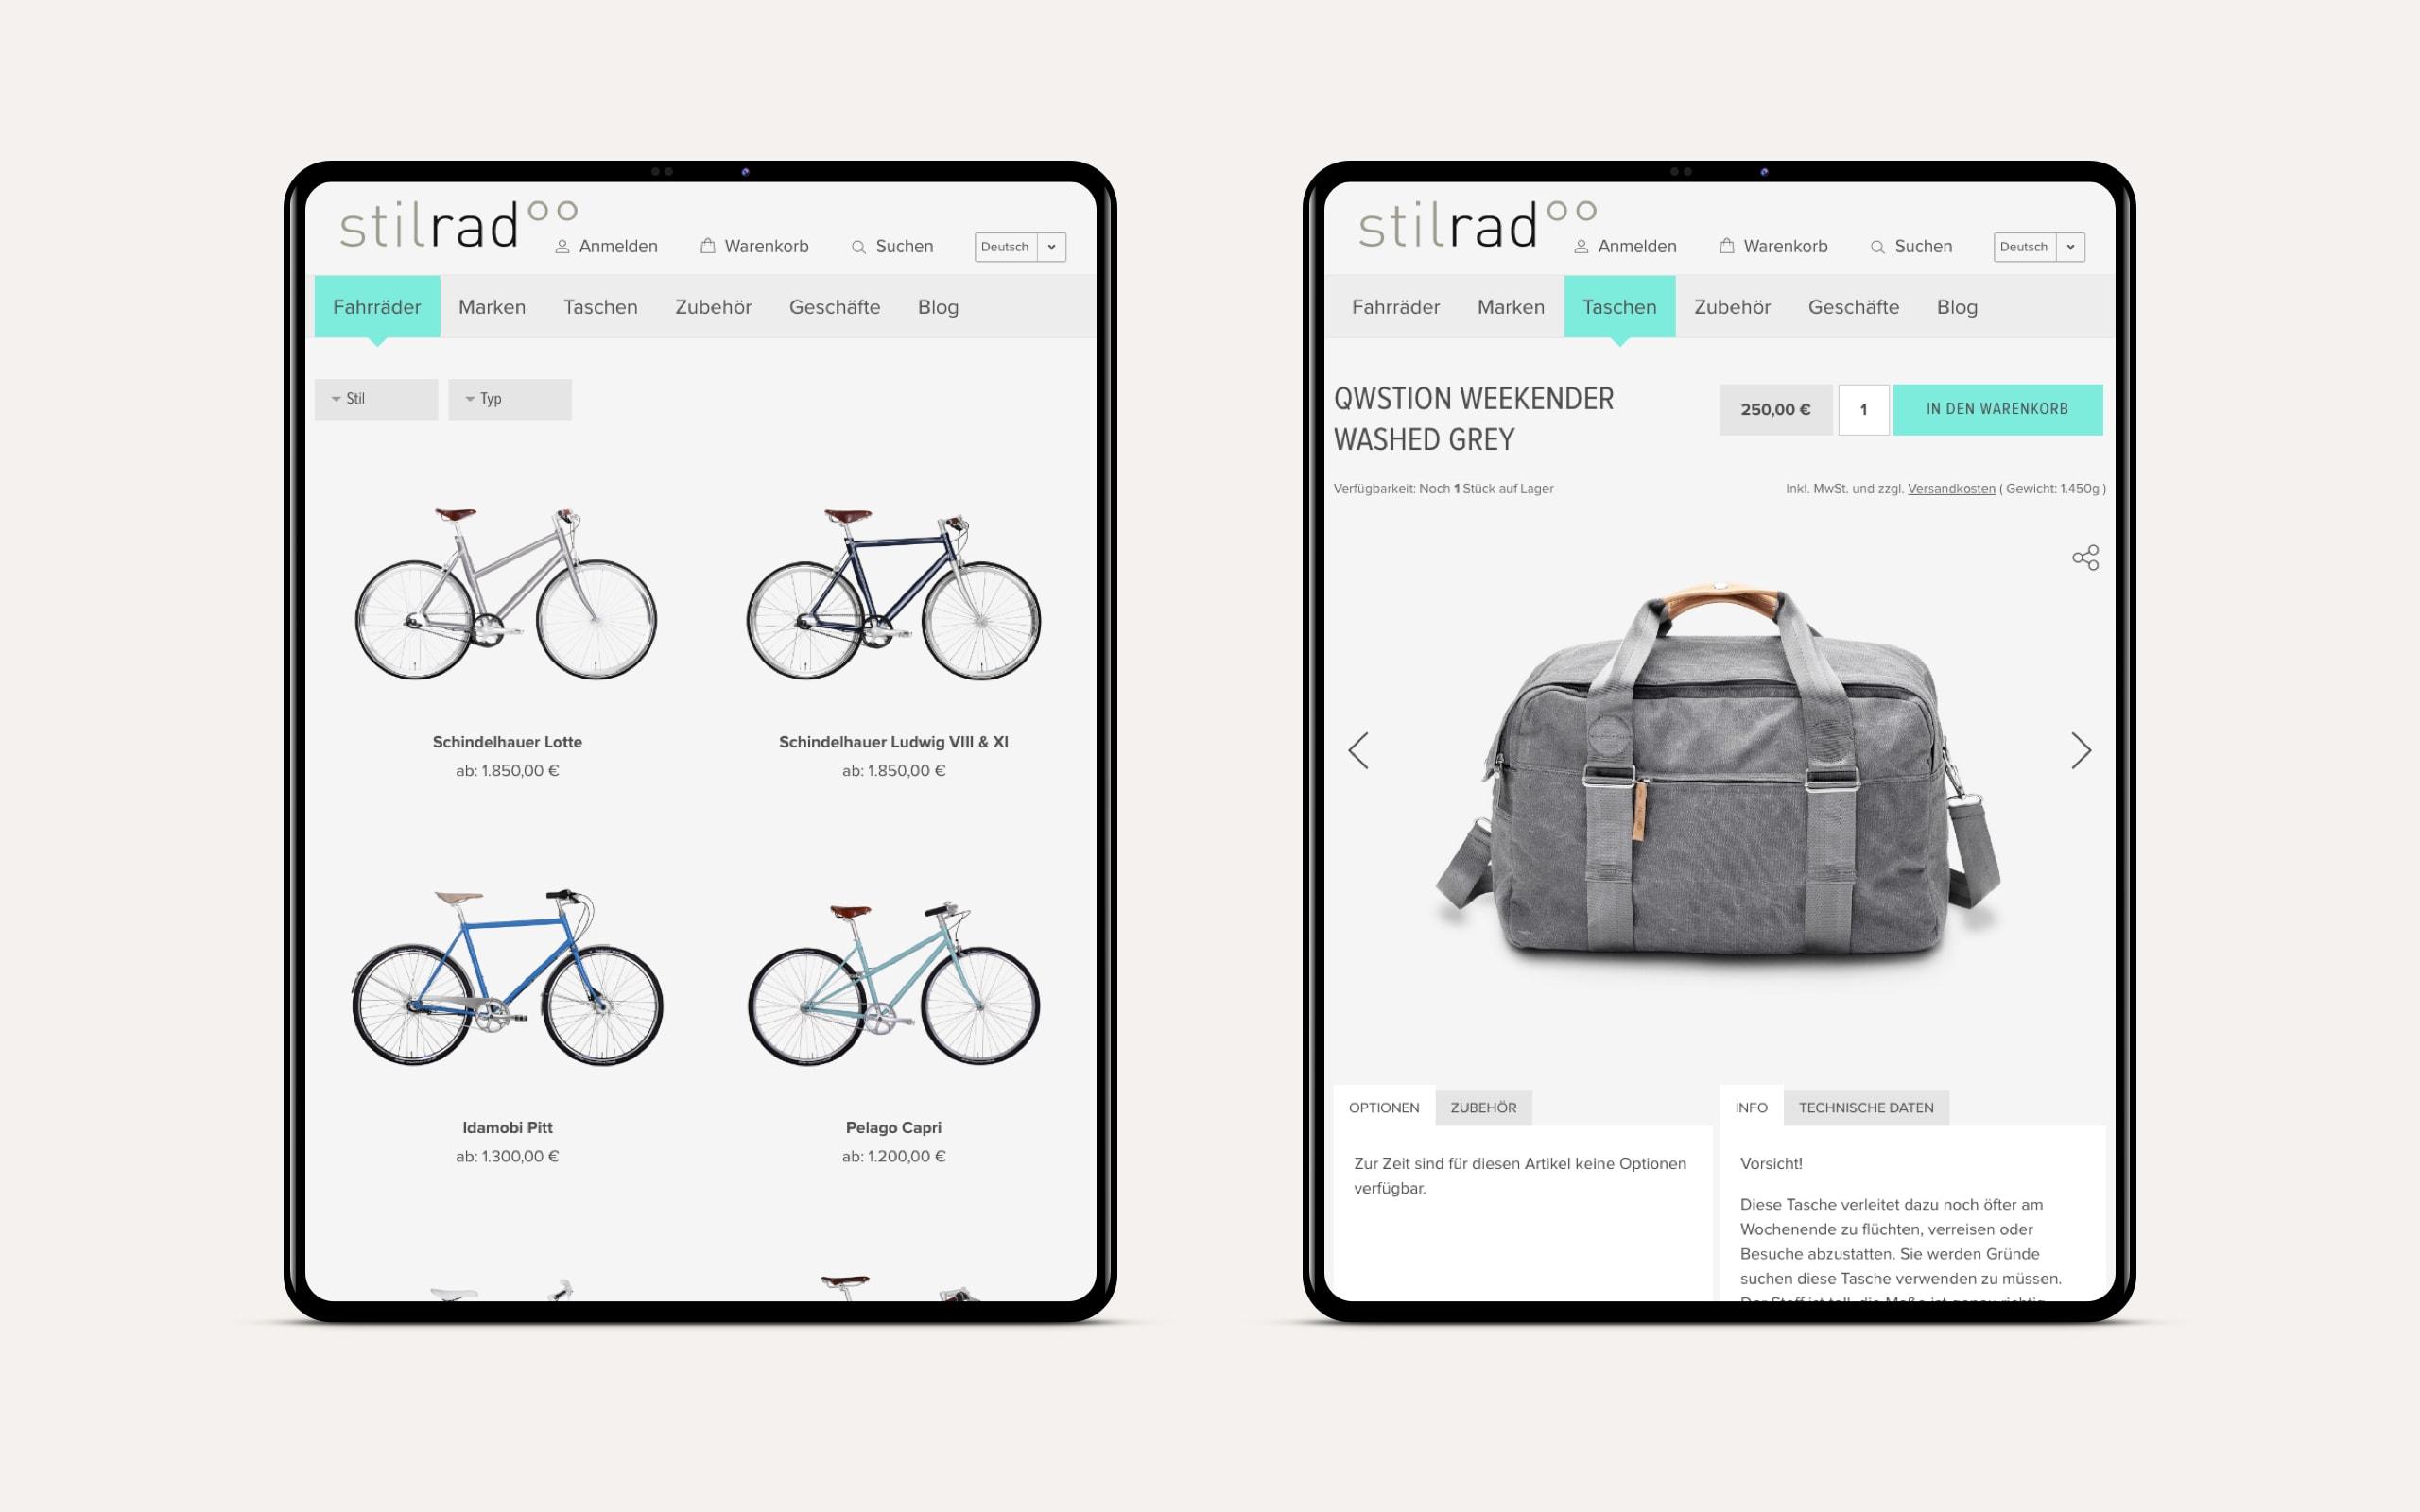 Stilrad Onlineshop Produktseiten [tablet]